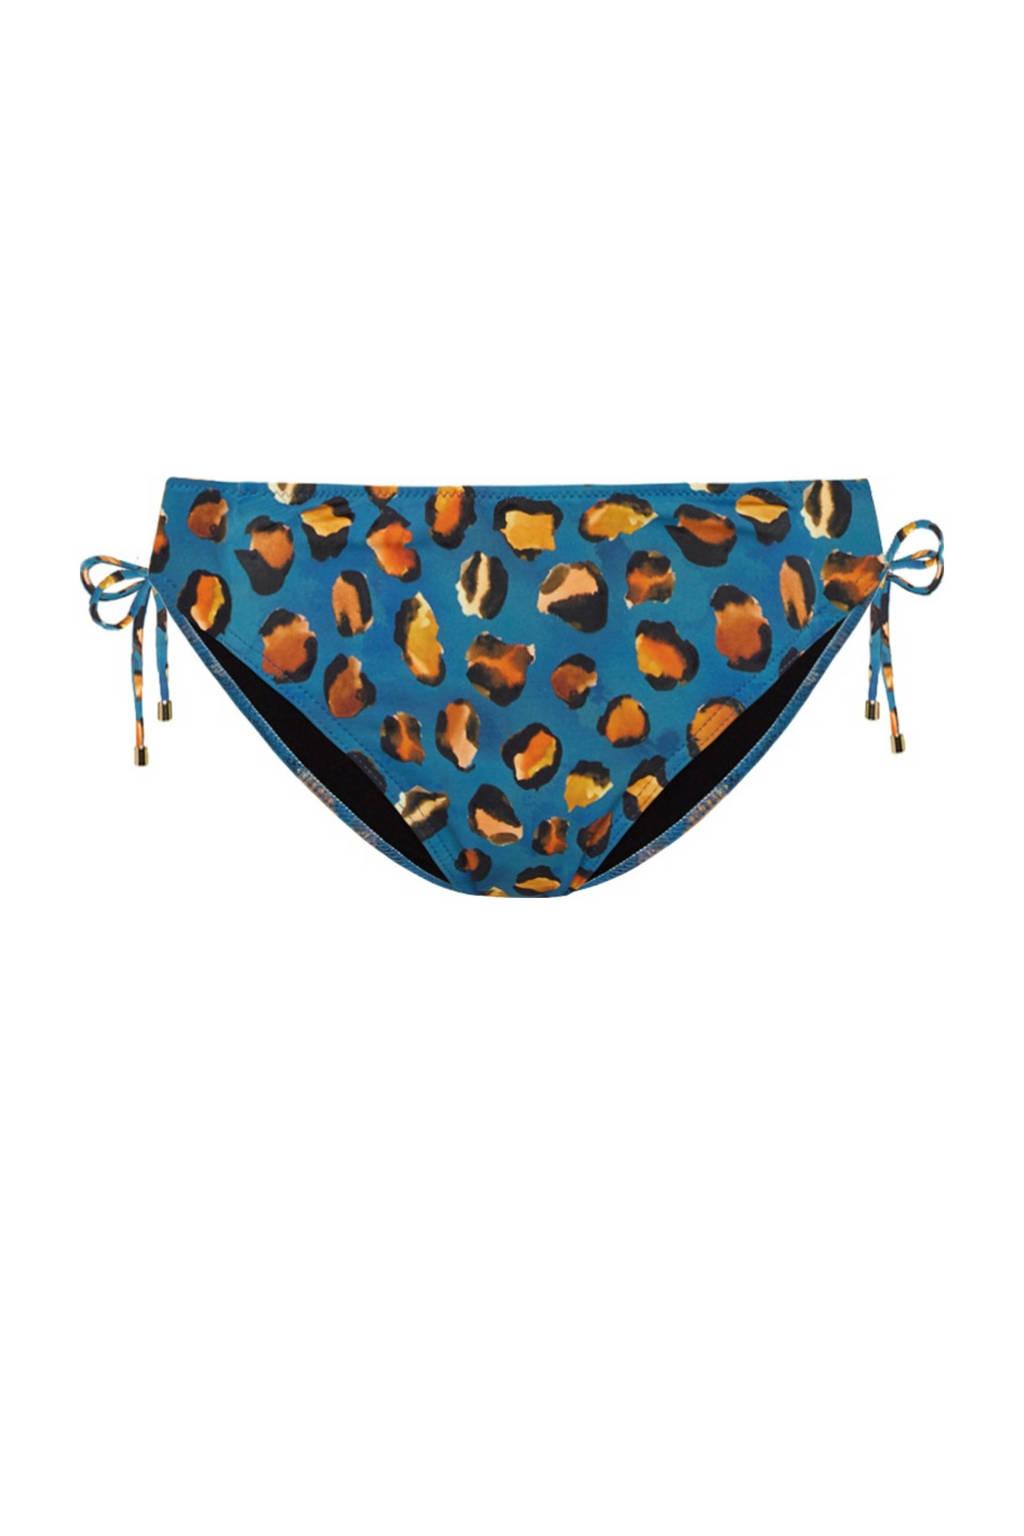 Cyell strik bikinibroekje met panterprint blauw/oranje, Blauw/oranje/geel/zwart